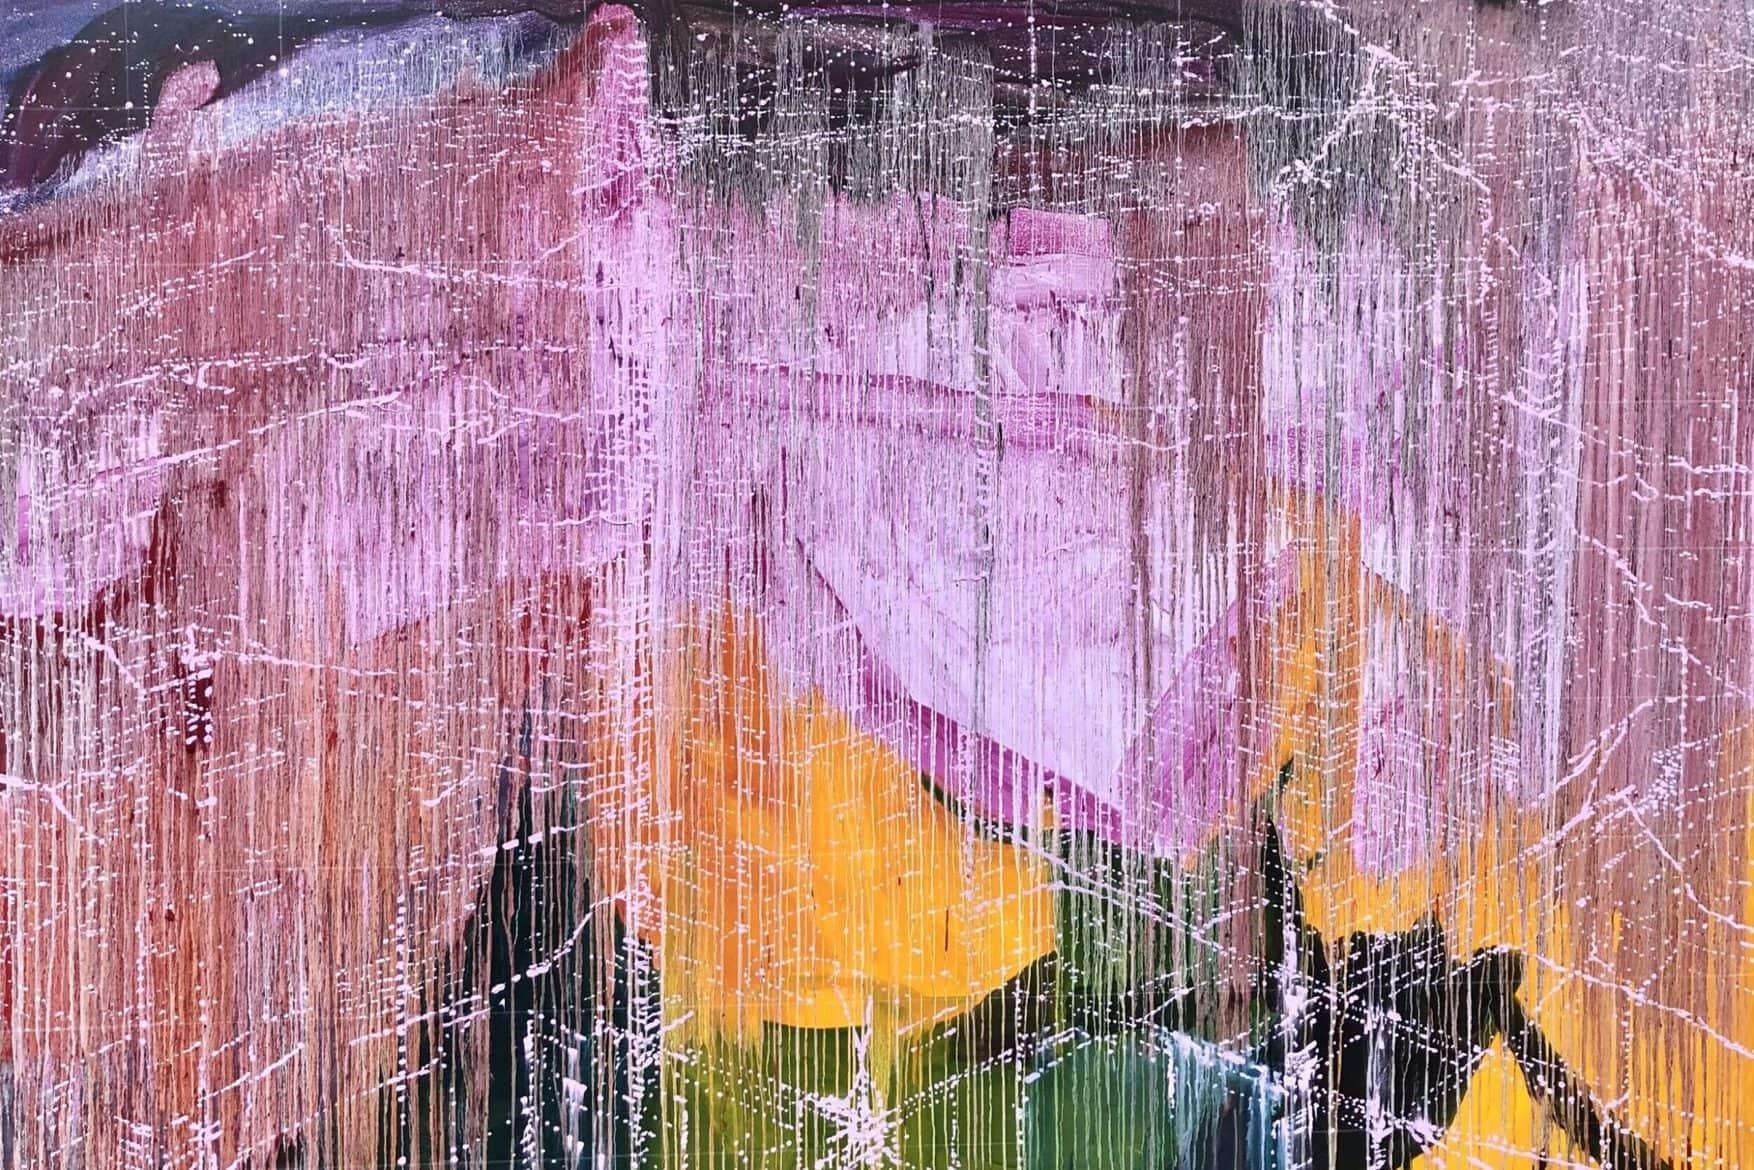 'Pink Variance 3', 2020-21, oil on linen, 183 x 250 cm